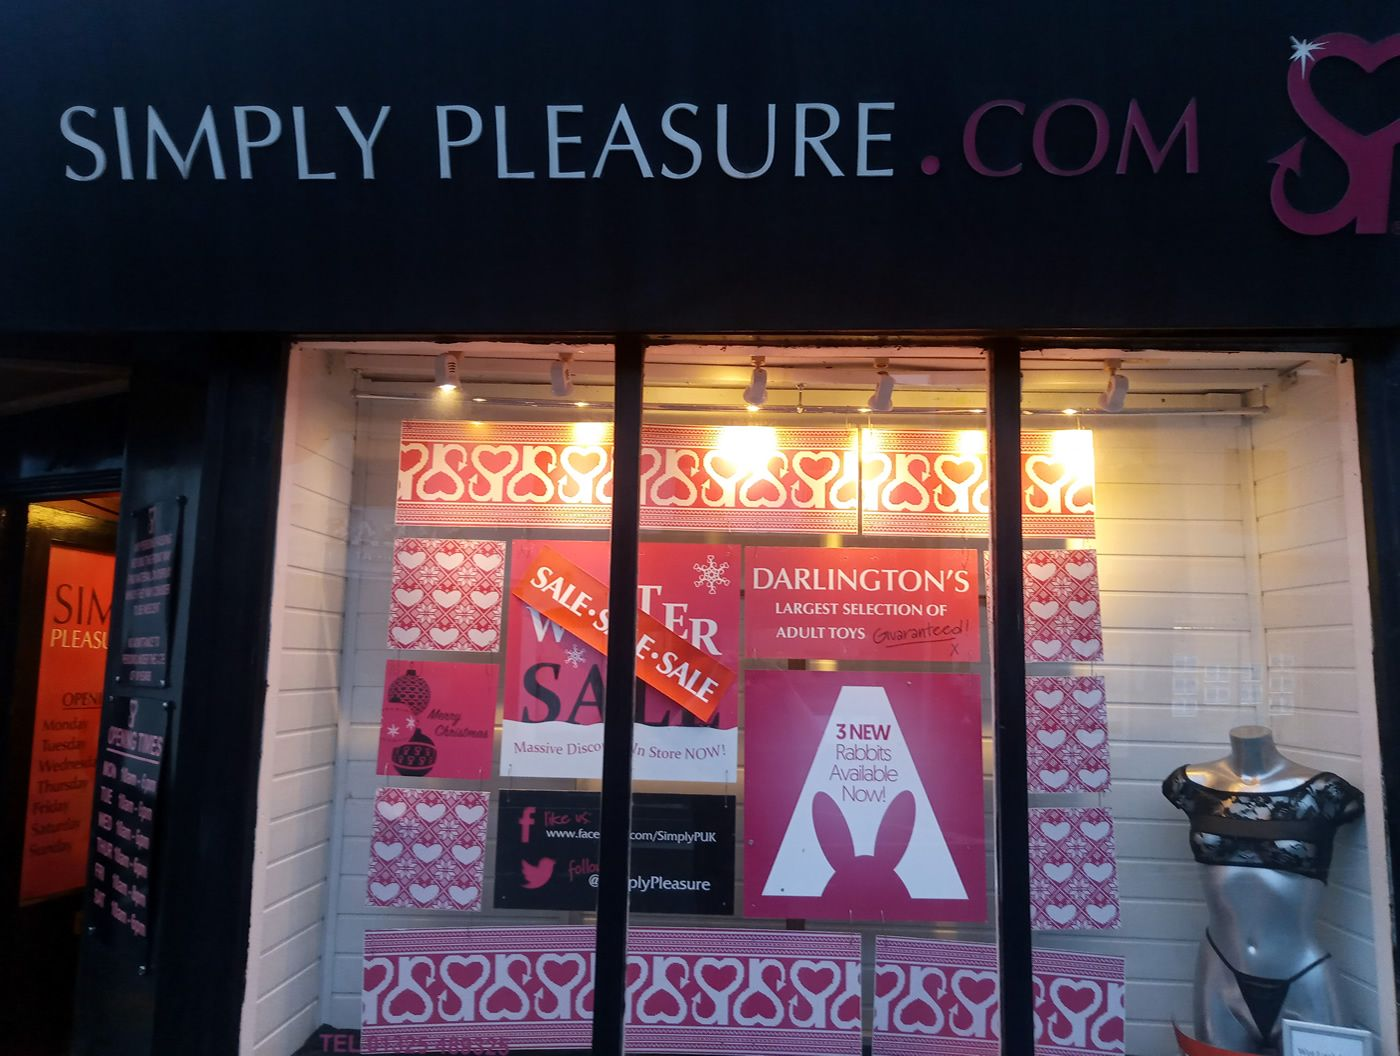 Darlington Simply Pleasure